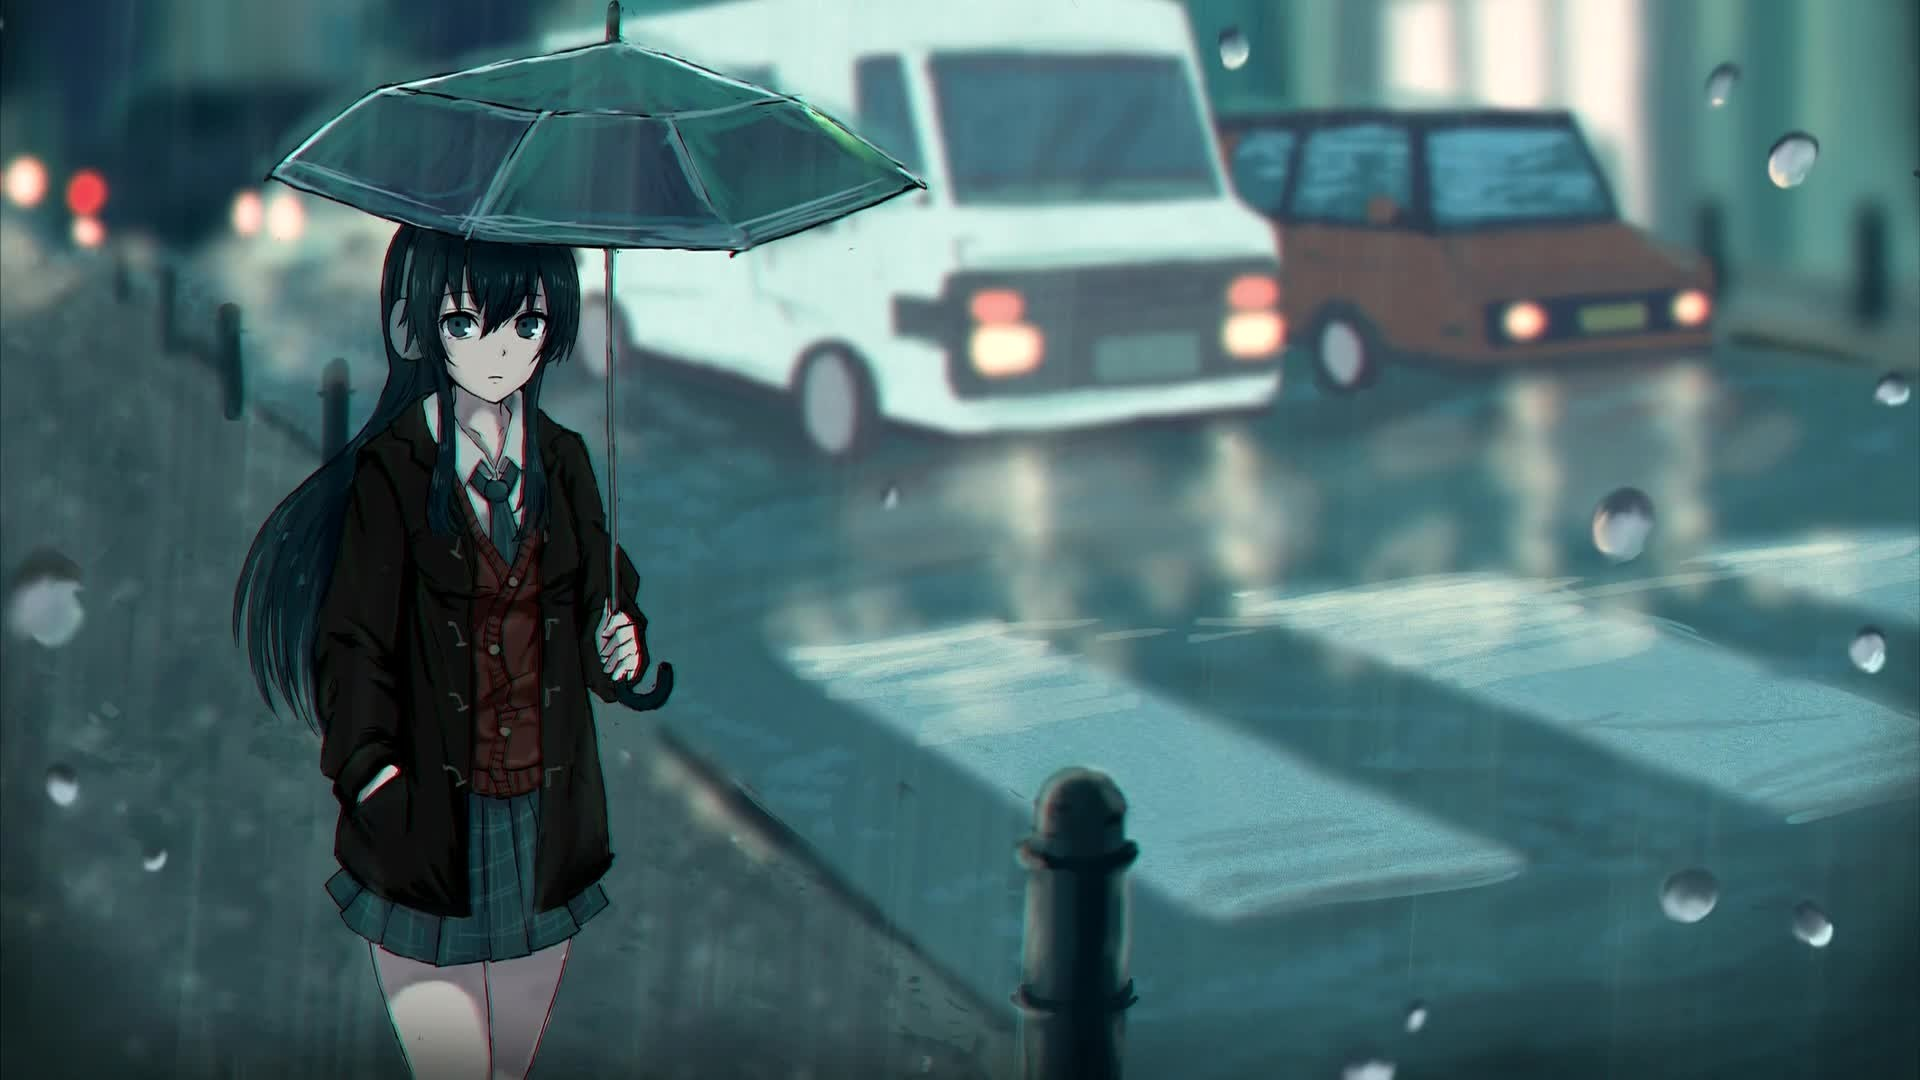 Anime Rain Full HD Wallpaper